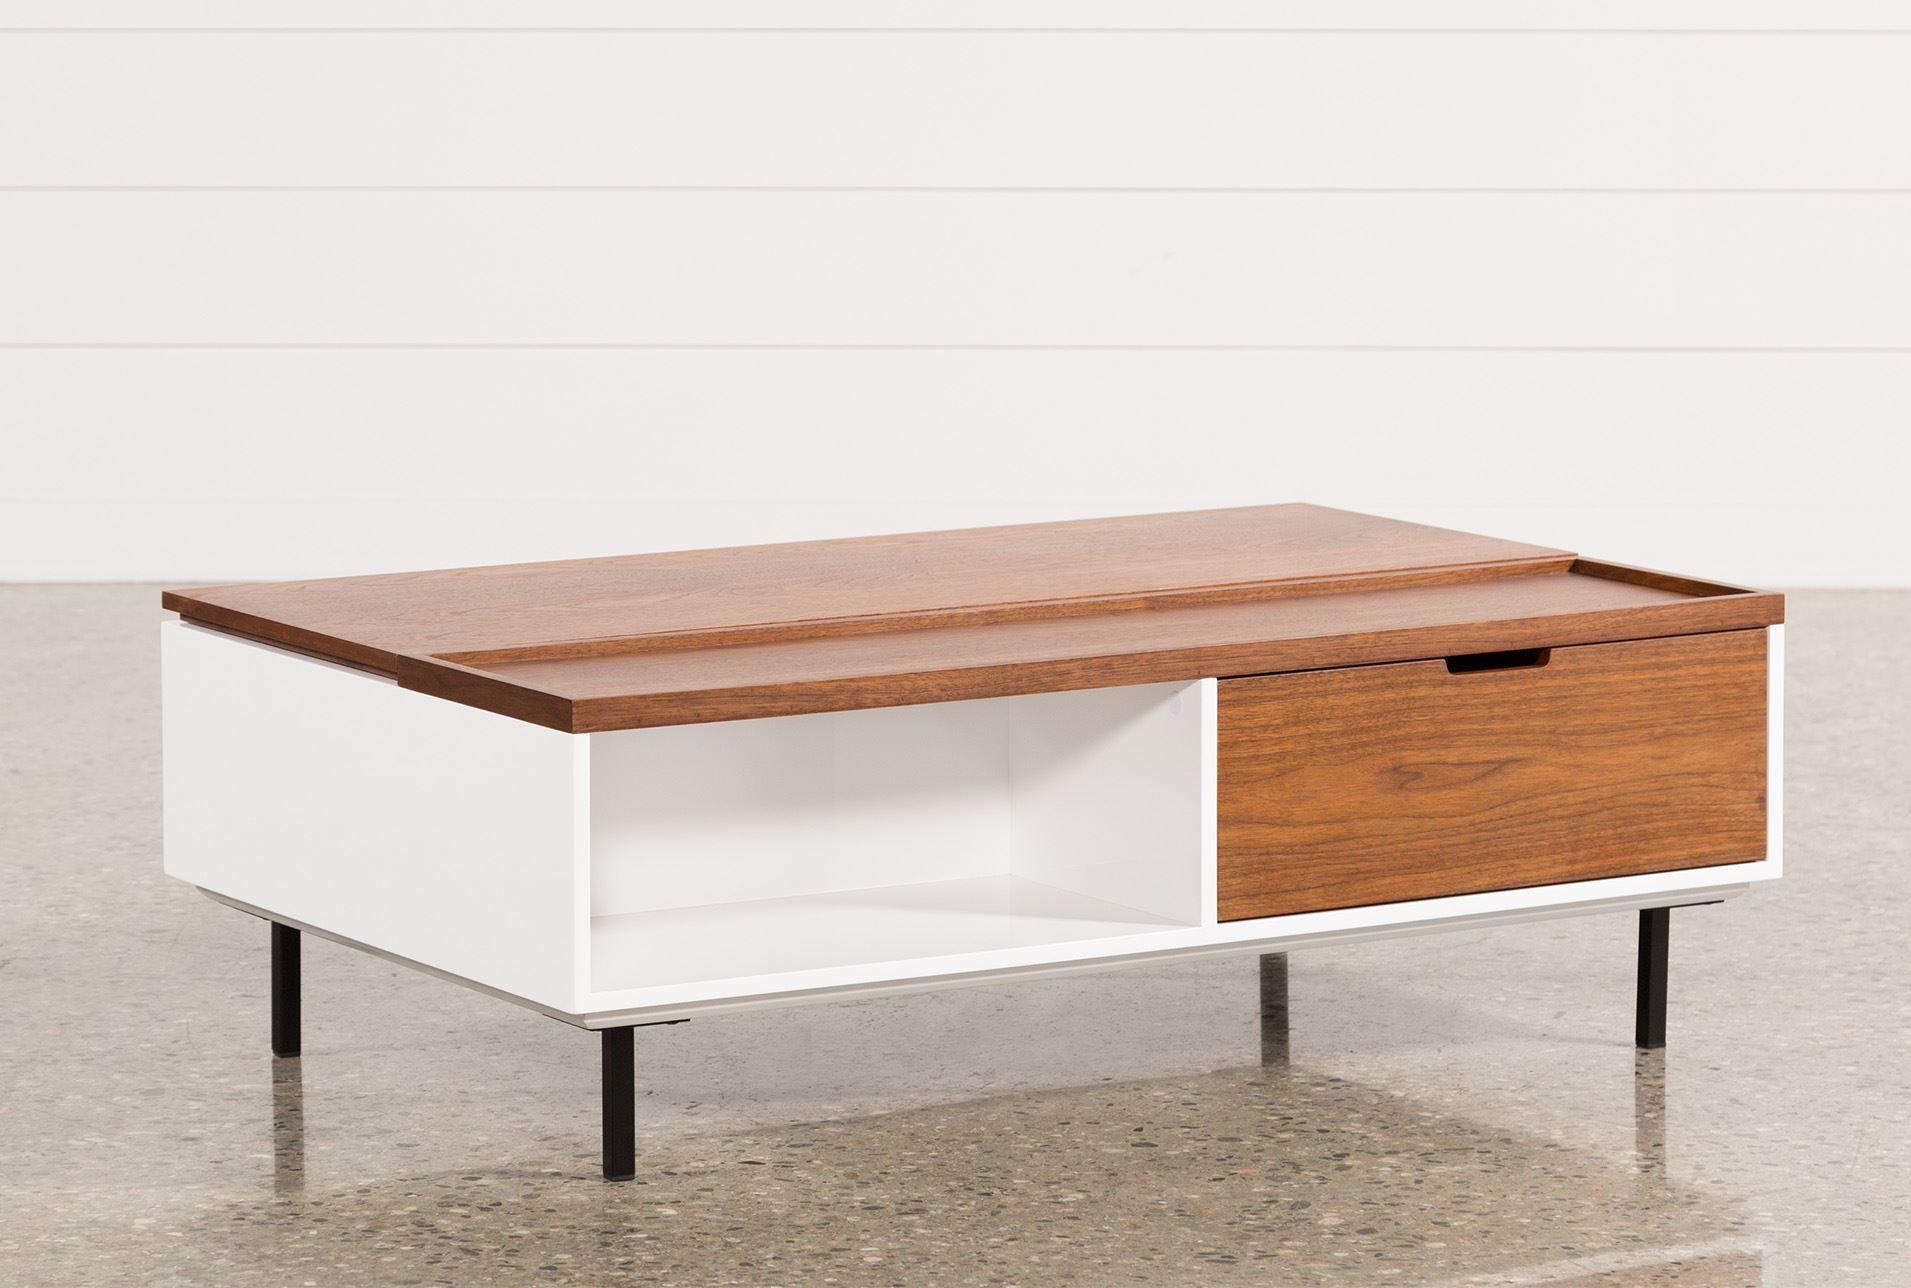 Stupendous Jasper Lift Top Coffee Table Furniture Lift Top Coffee Beatyapartments Chair Design Images Beatyapartmentscom